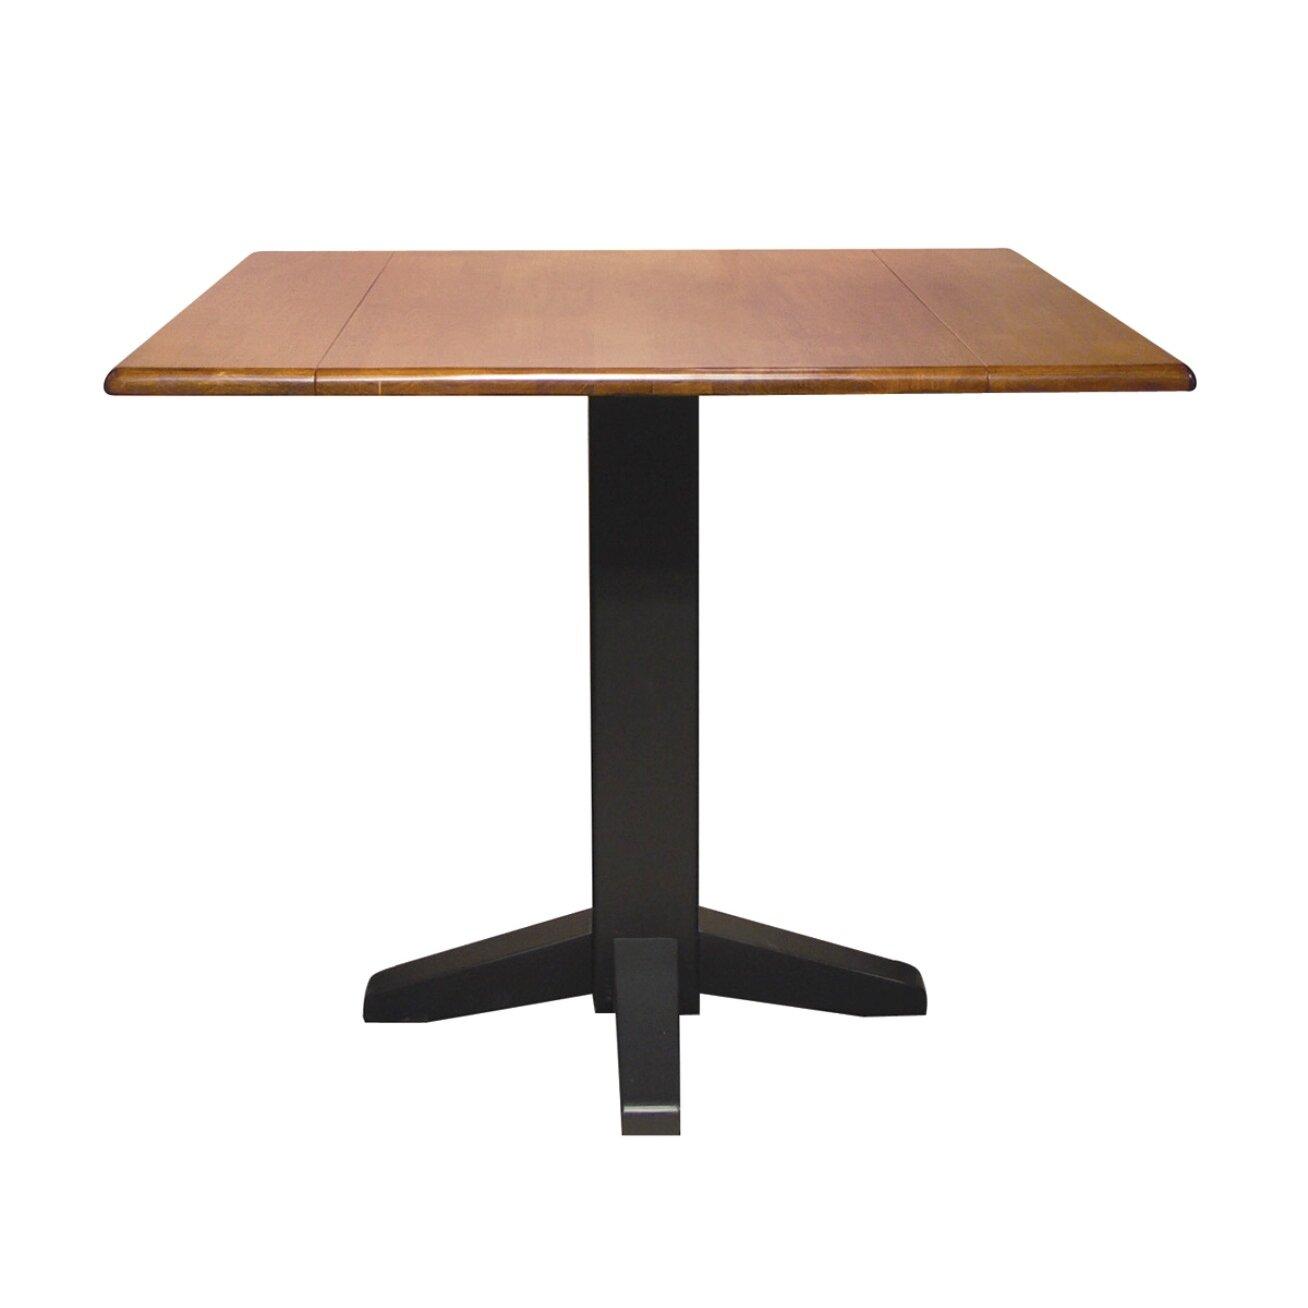 International Concepts Square Dual Drop Leaf 36. Steel Desk Legs. Courtney Barnett Tiny Desk. Ikea Desk System. Wall Desk Shelf. Children Chair Desk. Outdoor Umbrella Stand Table. Ikea Micke Desk For Sale. Staples Cash Drawer